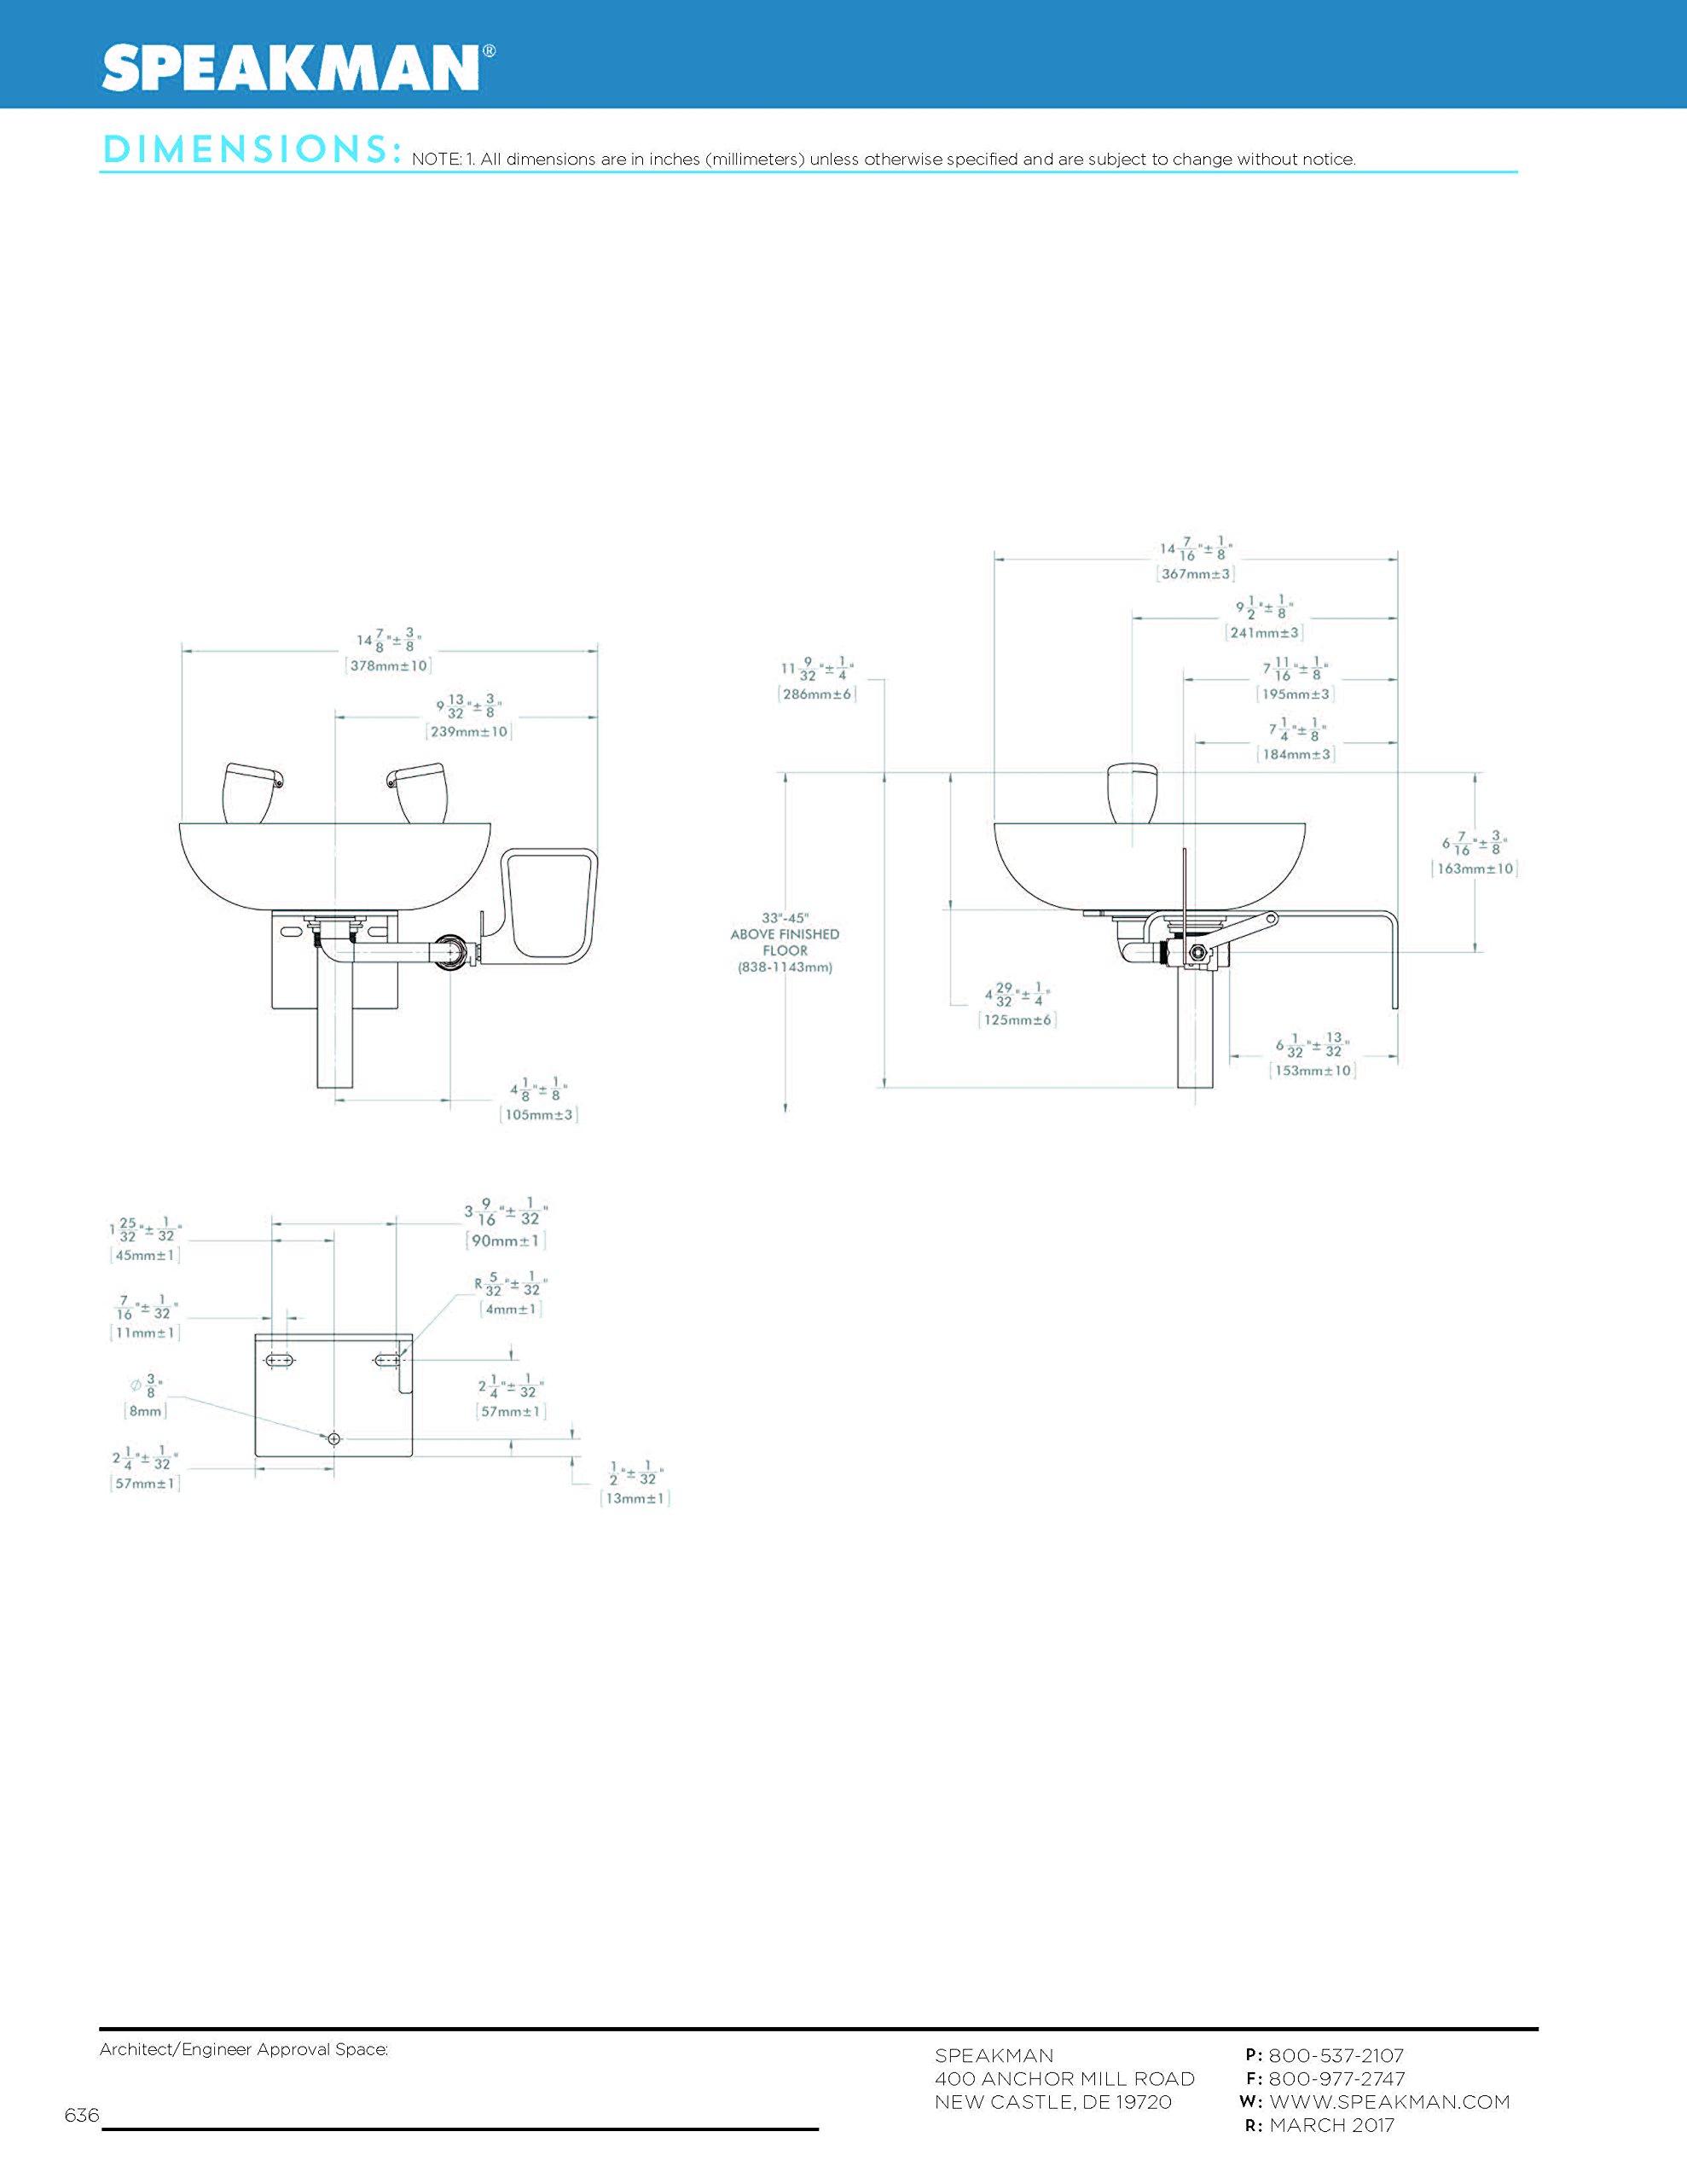 Speakman Traditional Series SE-580 Wall Mounted Eyewash with Plastic Bowl by Speakman (Image #7)